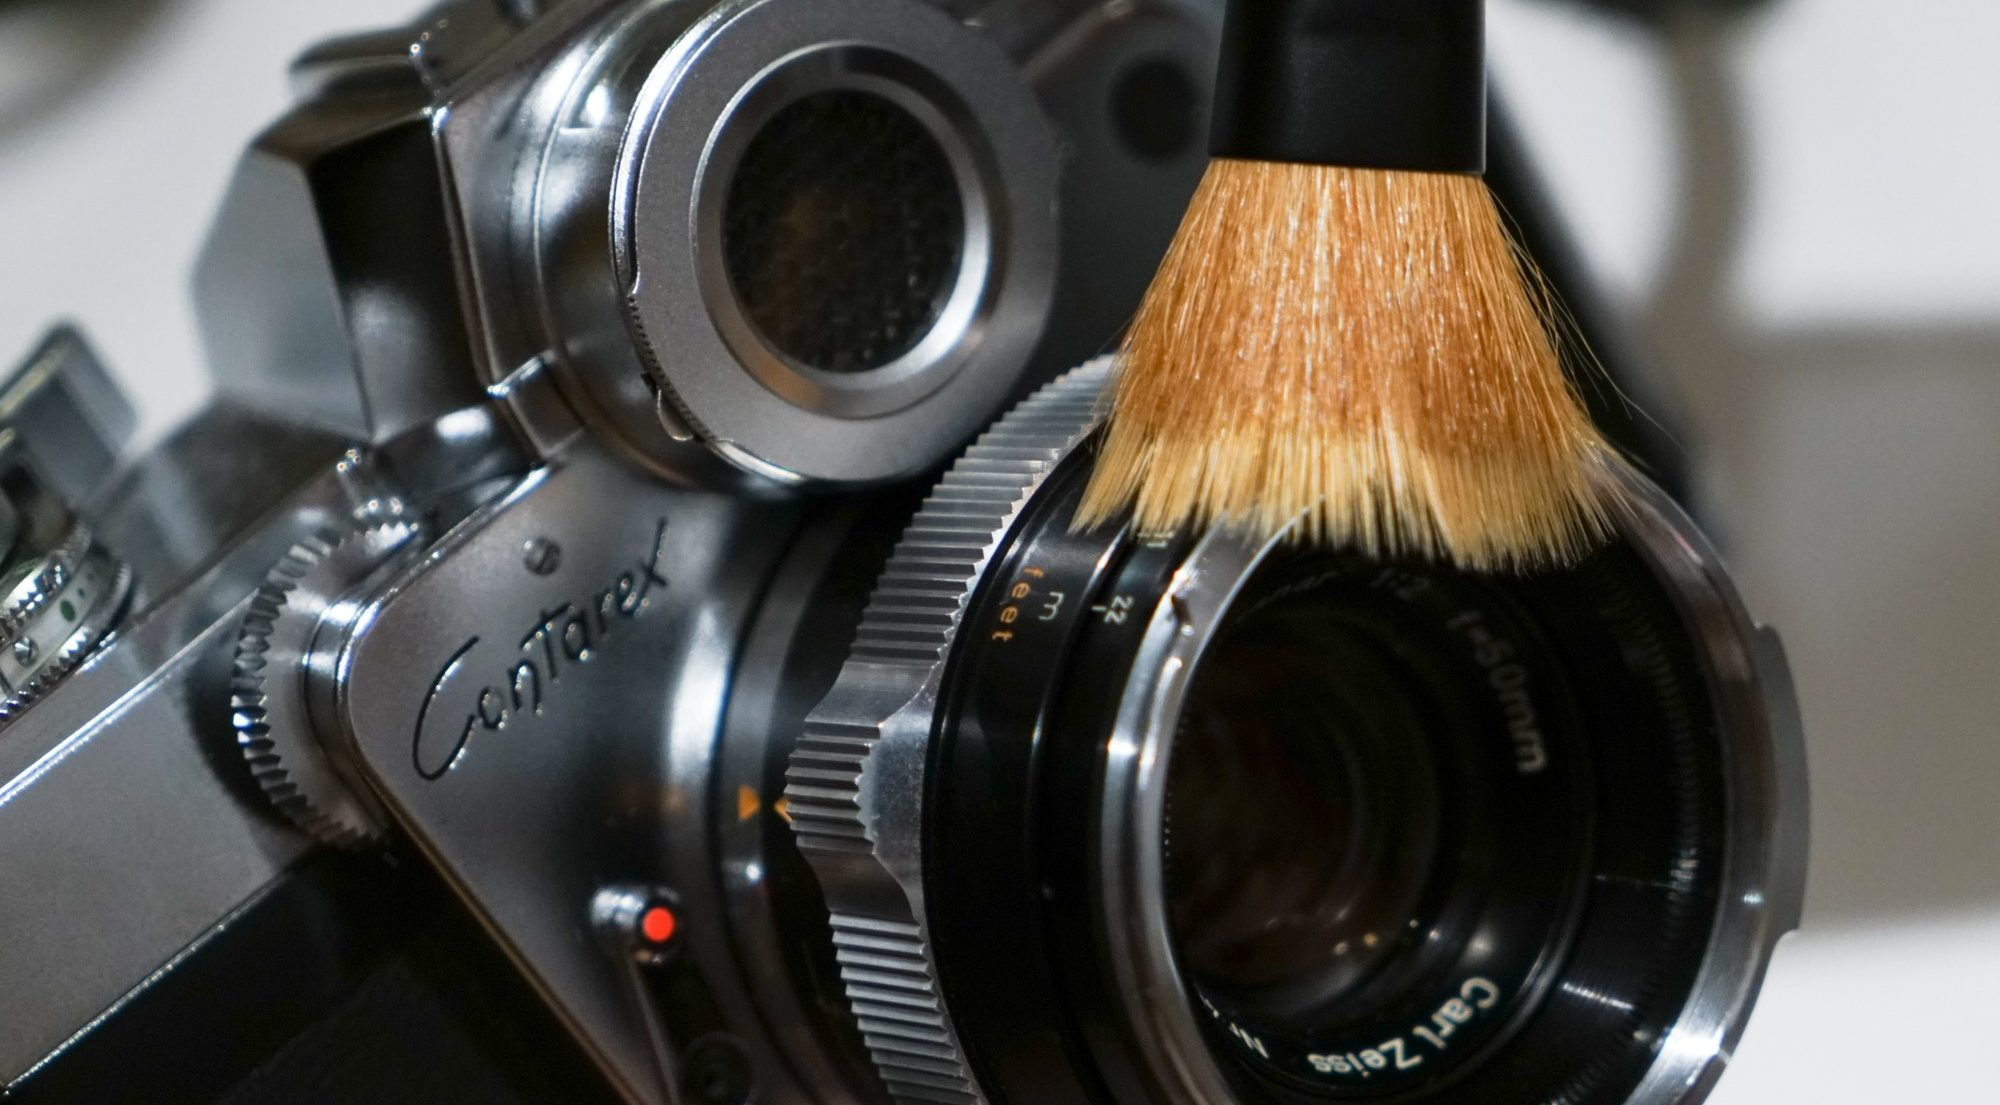 meilleur kit nettoyage appareil photo